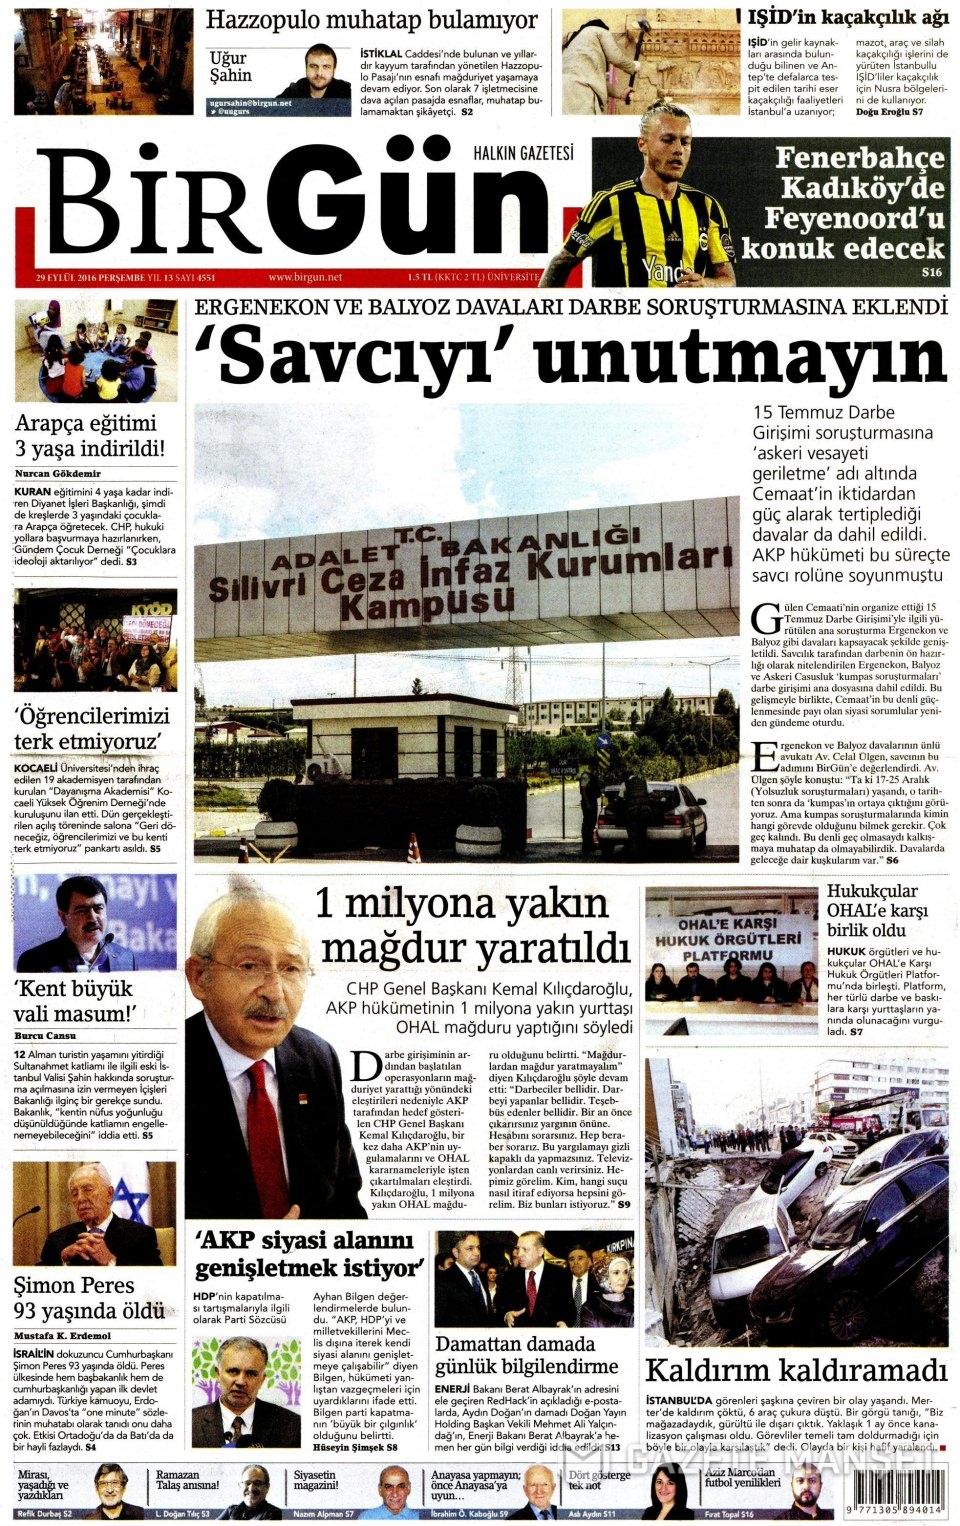 29 Eylül Perşembe gazete manşetleri 11